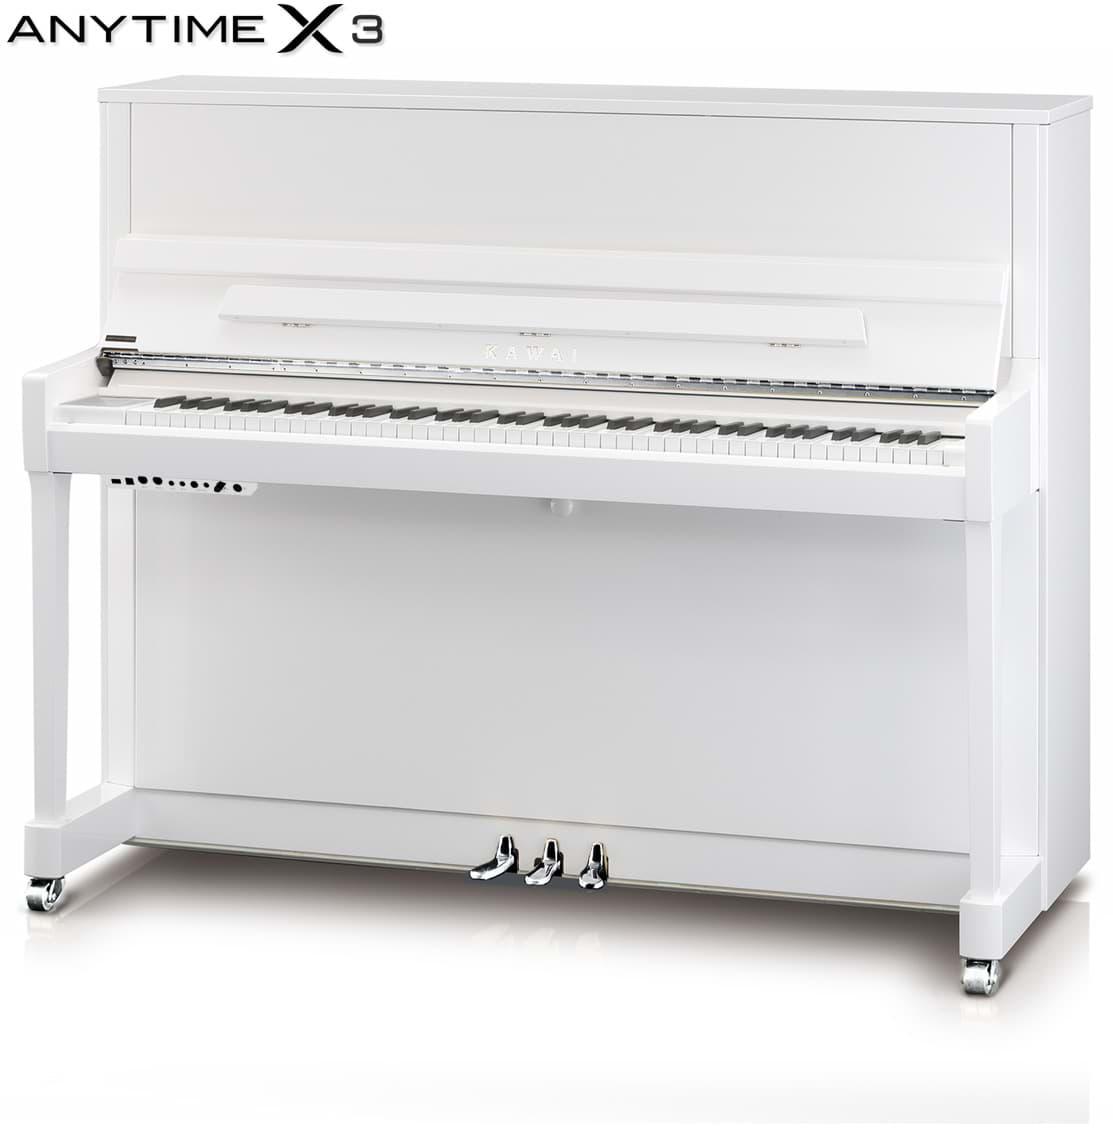 https://www.bauer-music.de/media/7049/catalog/kawai-k-300-atx-3-whp-silber-hybrid-klavier-weis-hochglanz.jpg